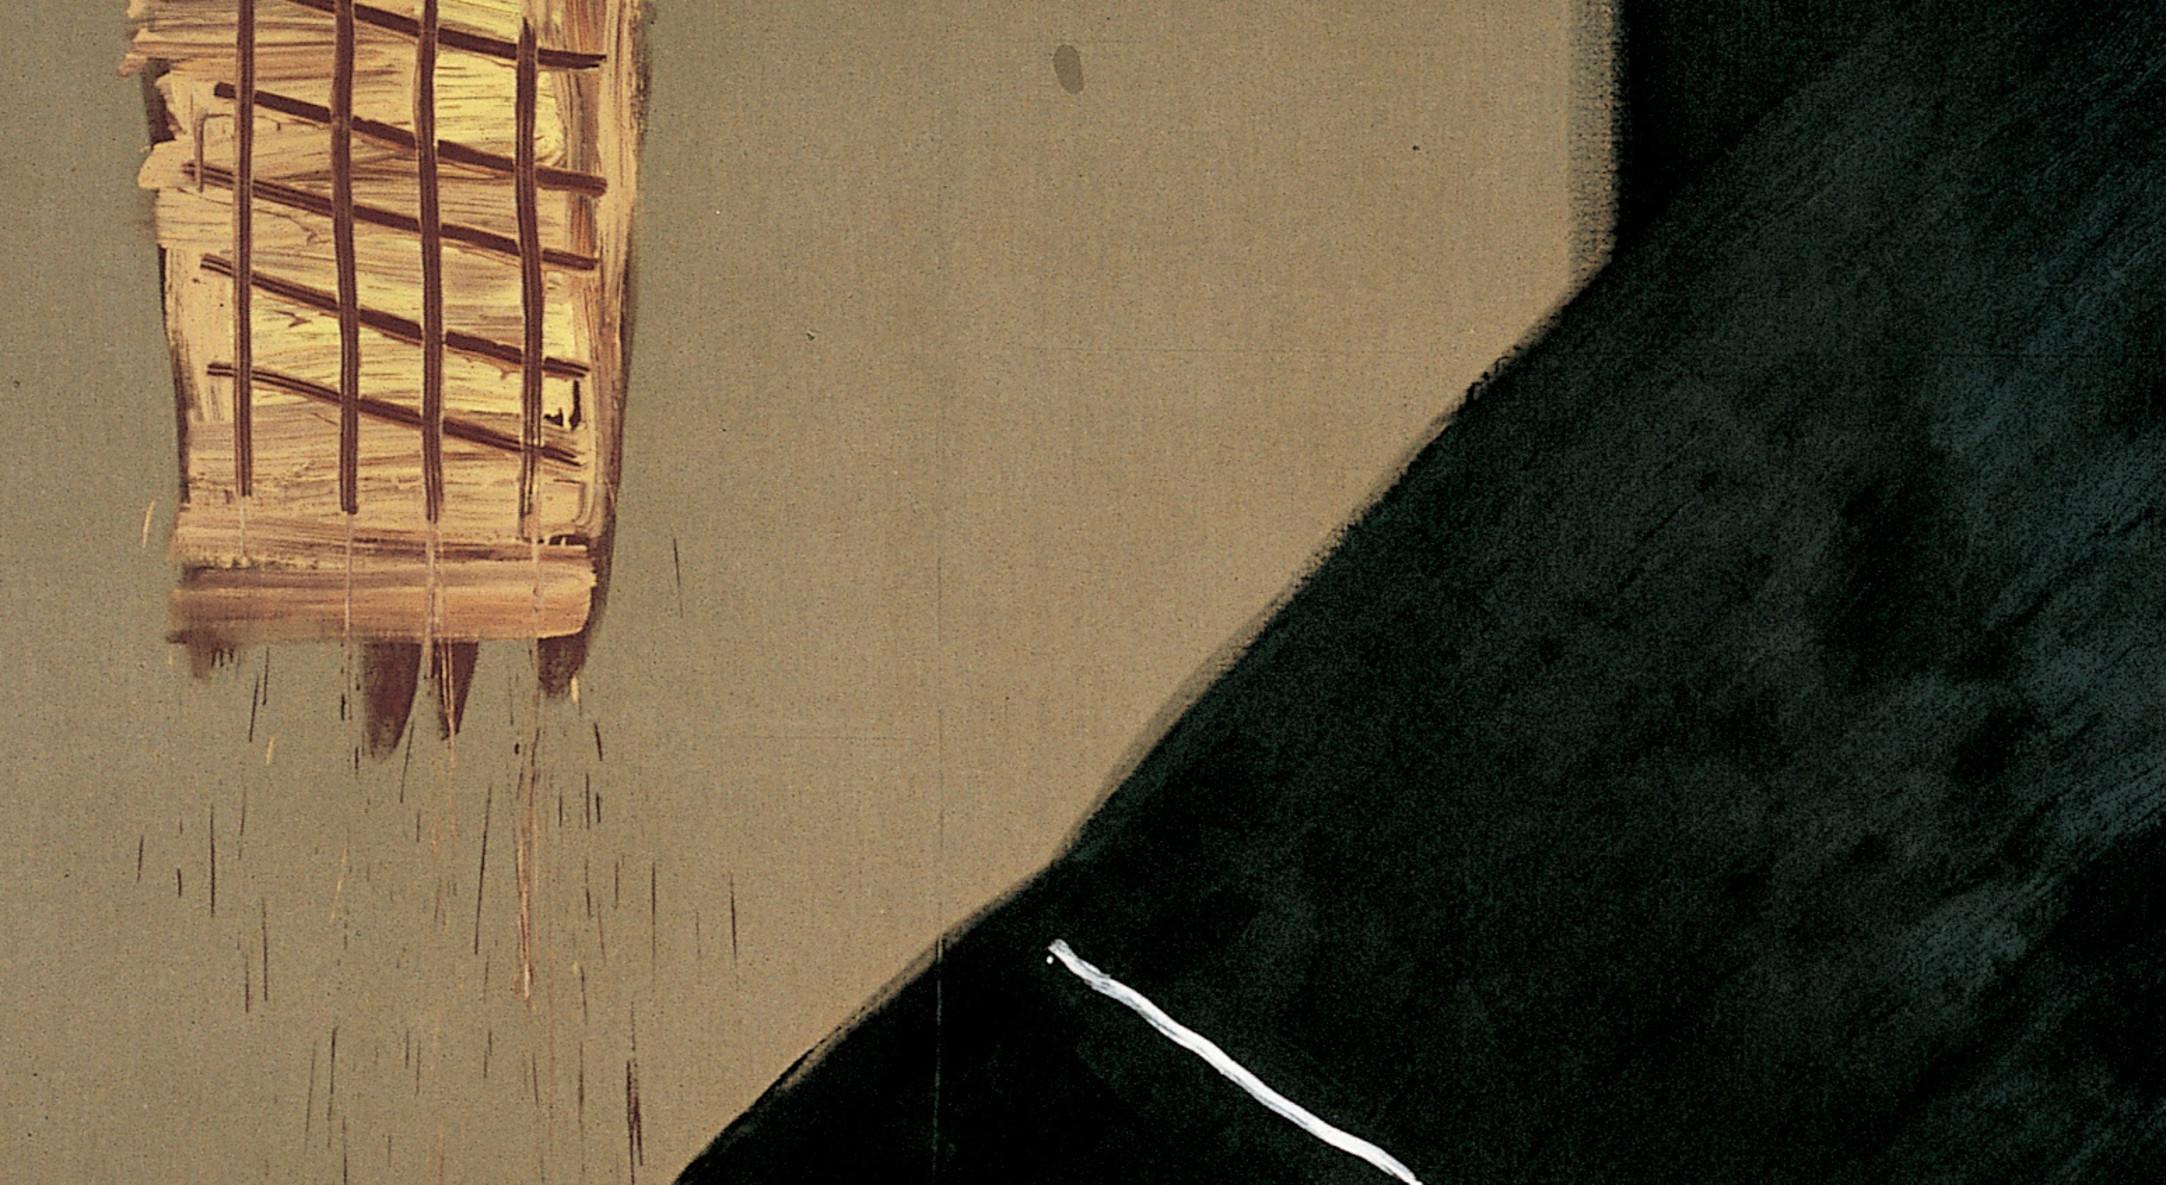 Detail of Basil Beattie, Imagine If, 1993